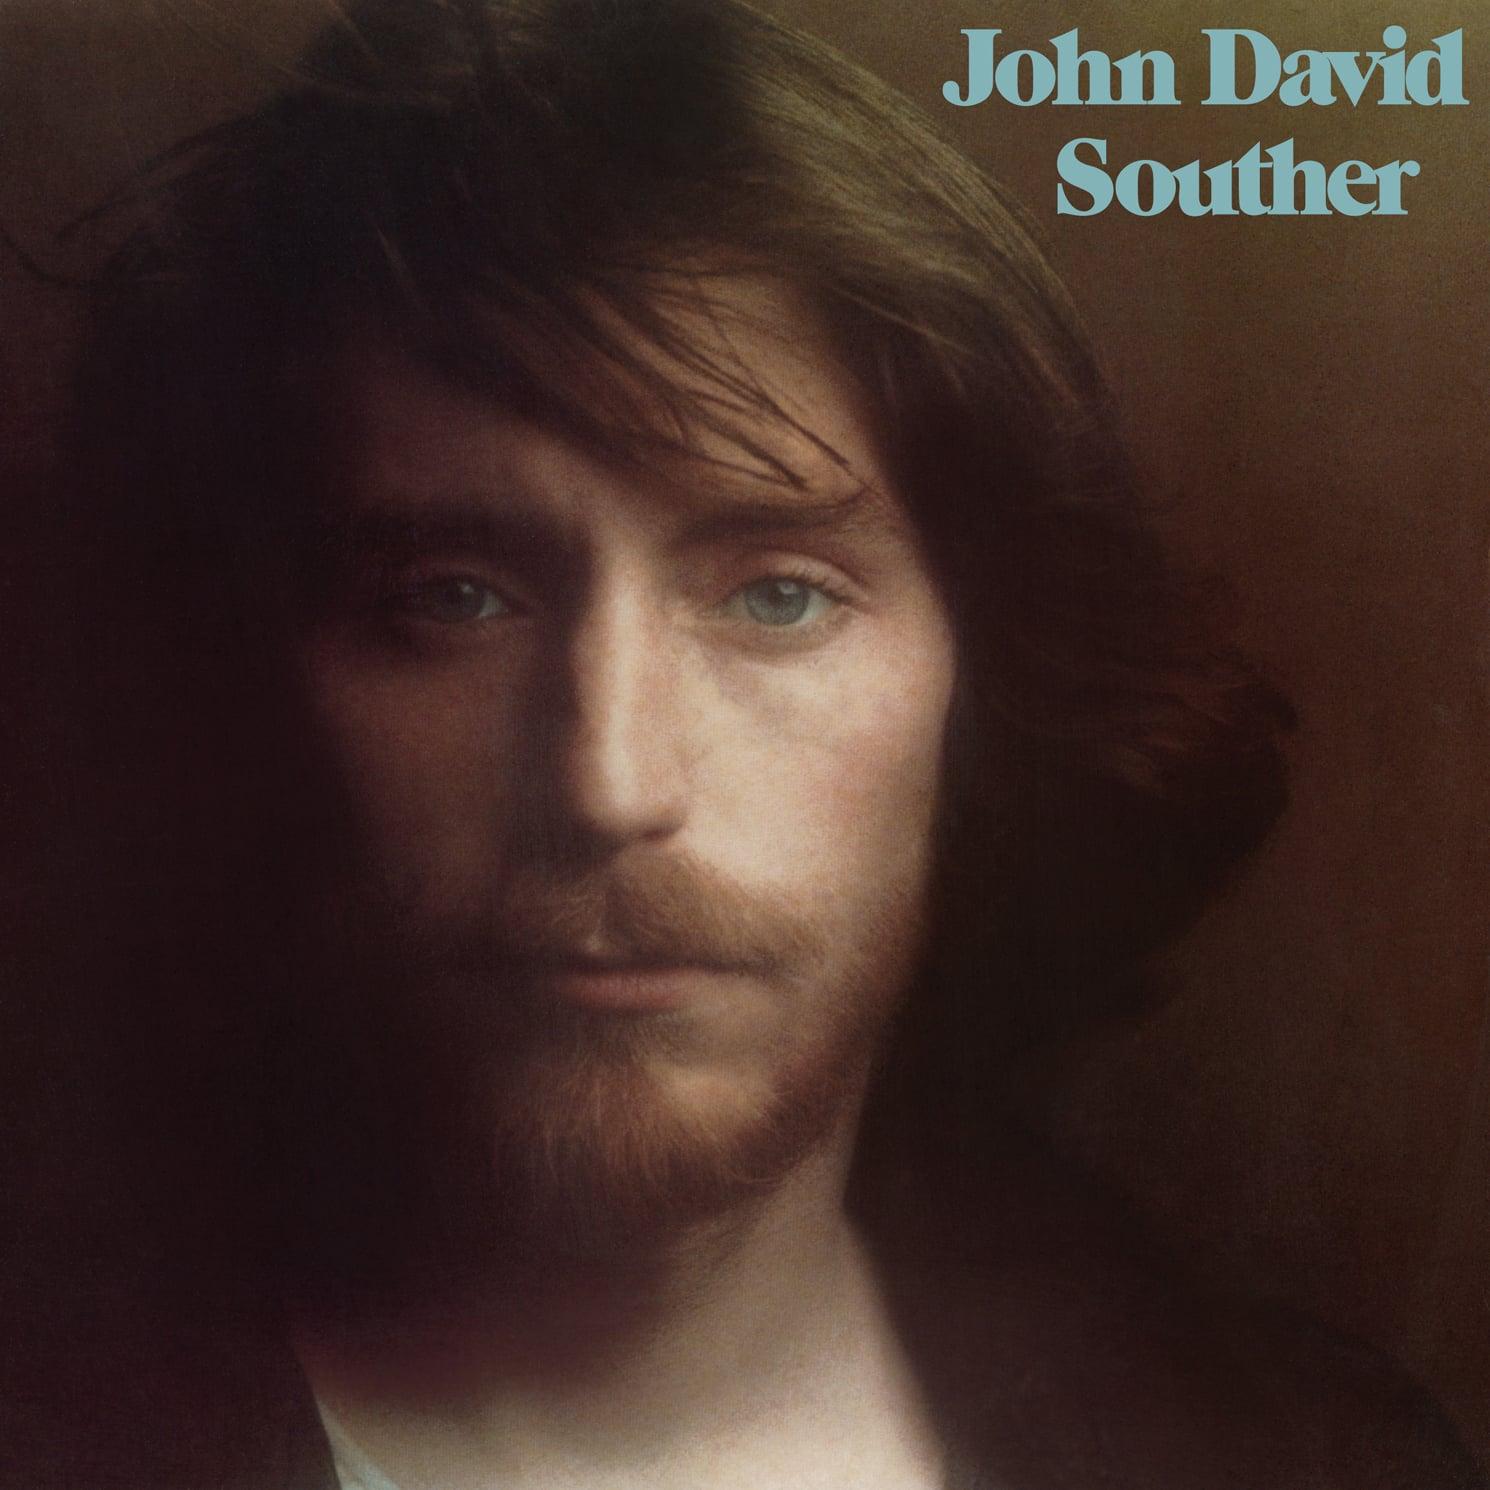 JD Souther - John David Souther  Release Date: December 18, 2015 Label: Omnivore Recordings  SERVICE: Mastering NUMBER OF DISCS: 1 GENRE: Rock FORMAT: CD   TRAILER